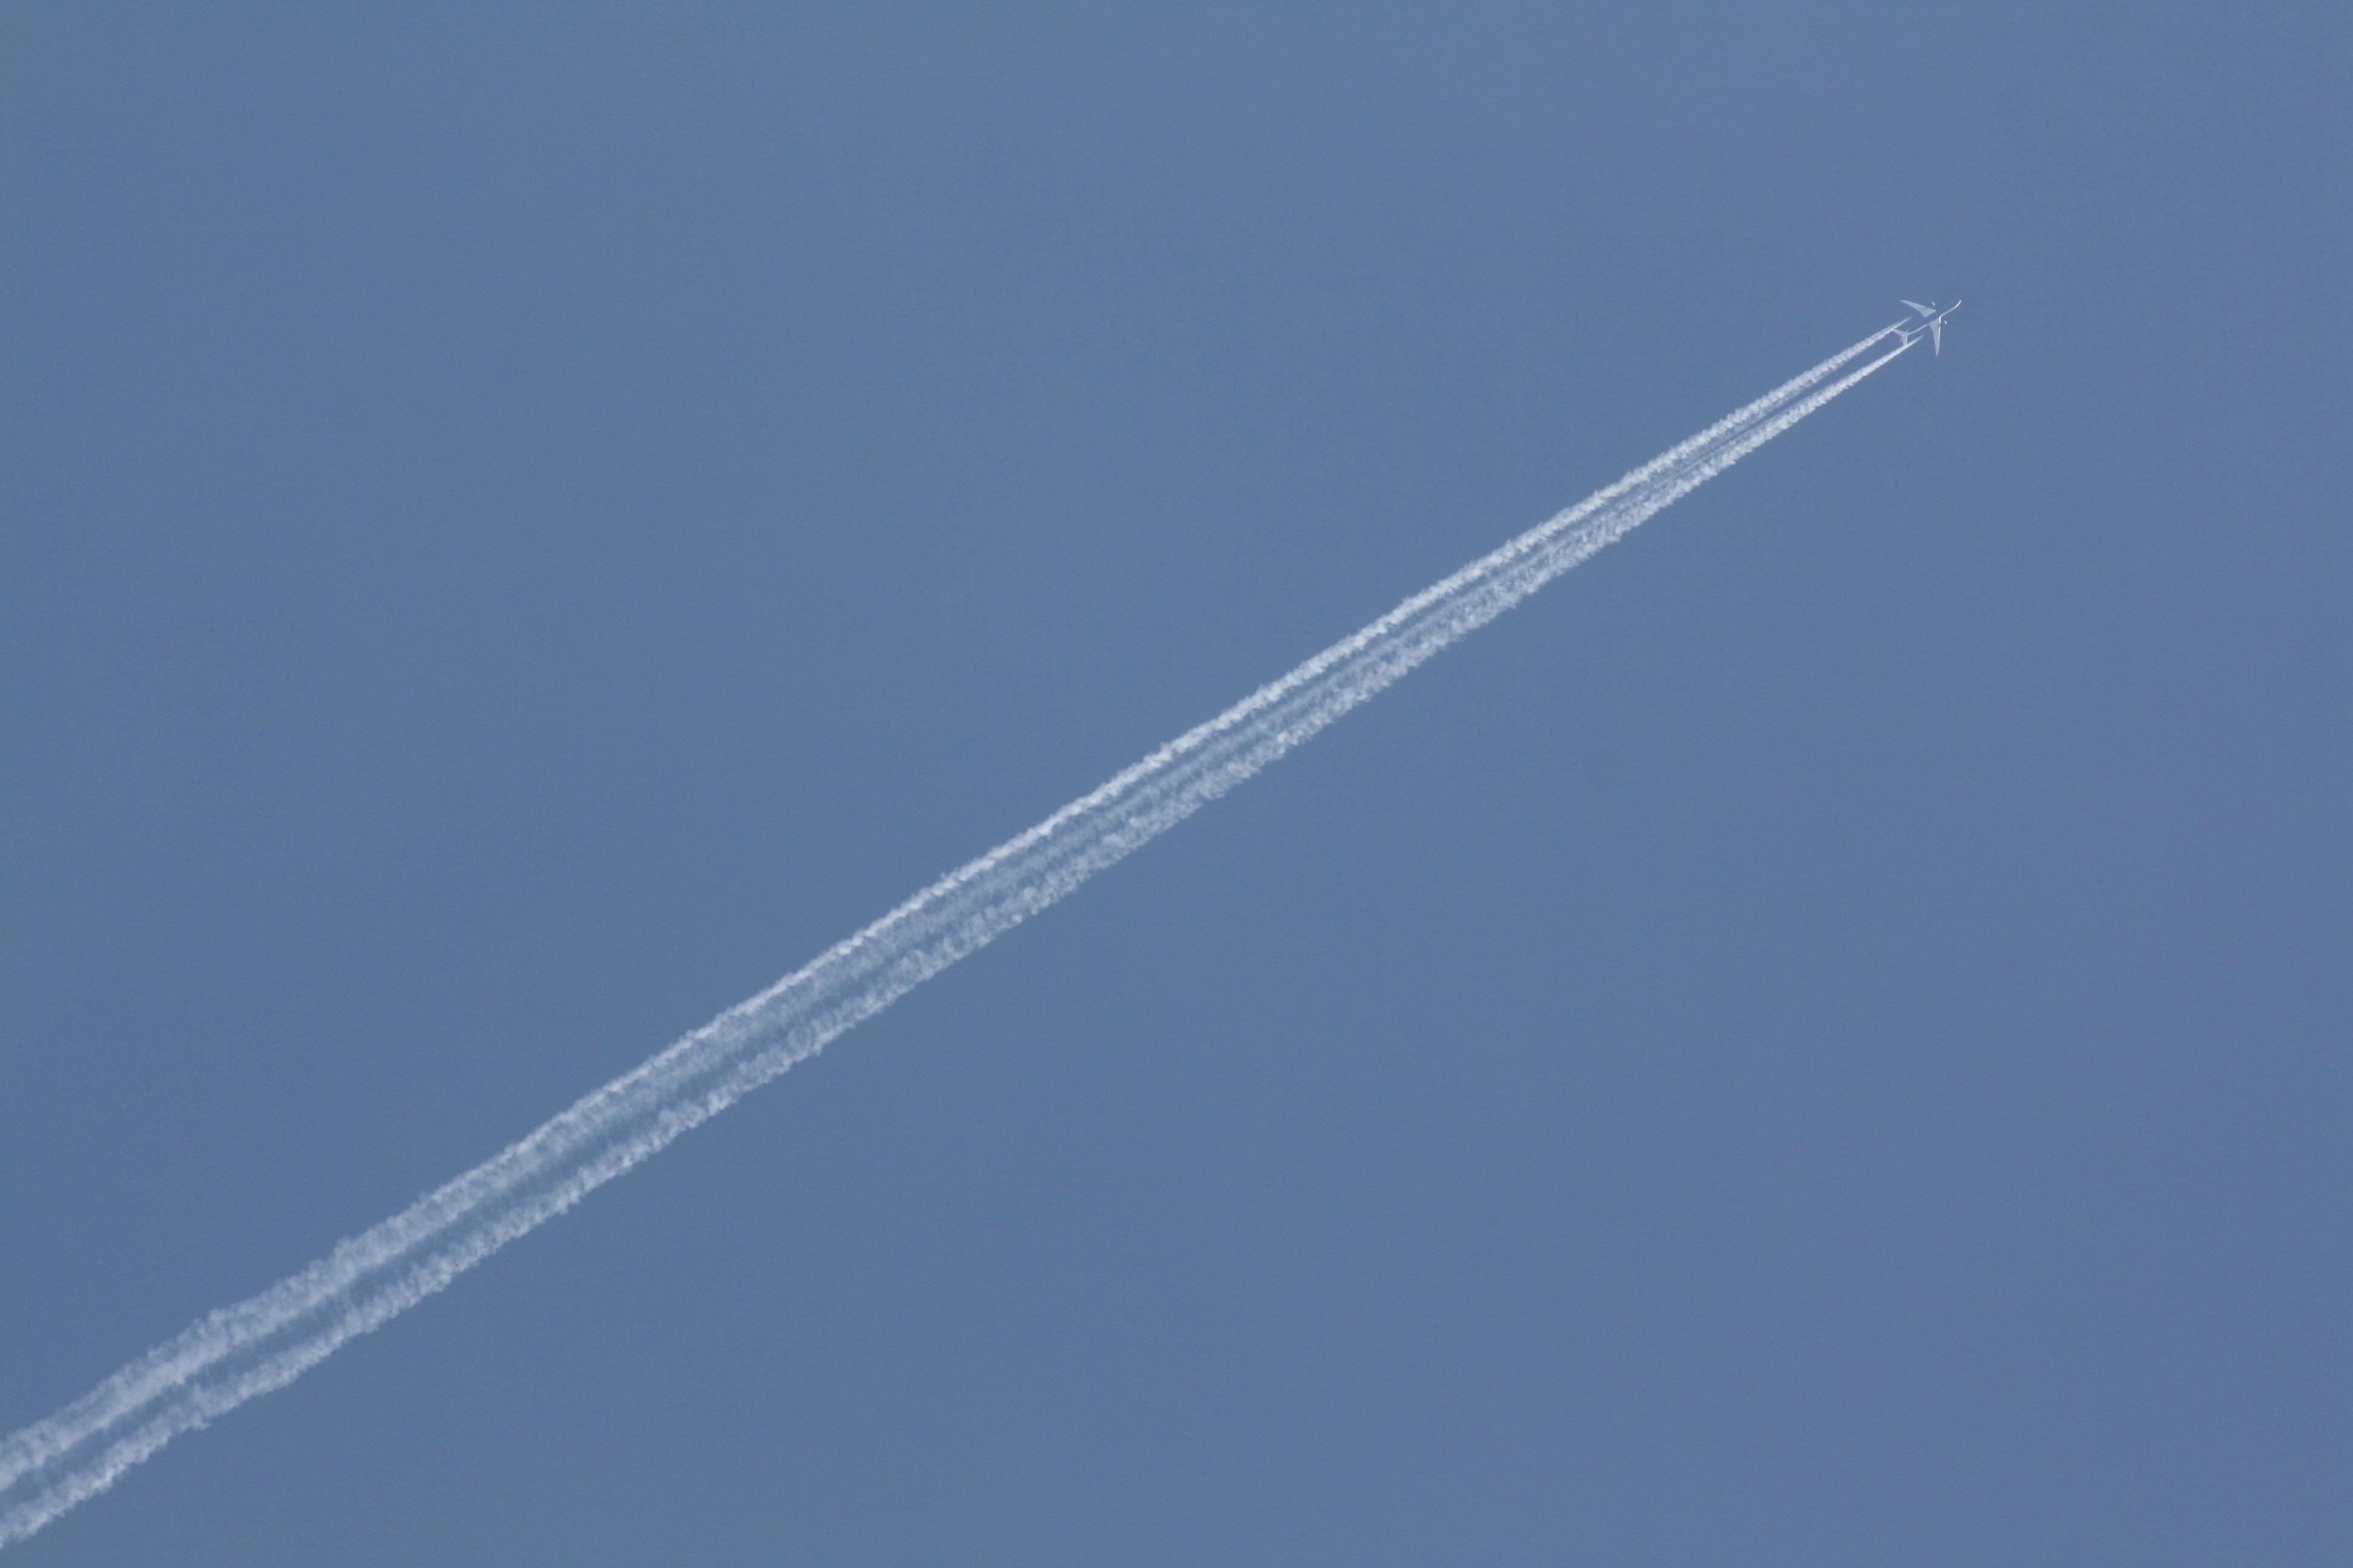 Naam: Boeing backgarden.jpg Bekeken: 571 Grootte: 391,7 KB